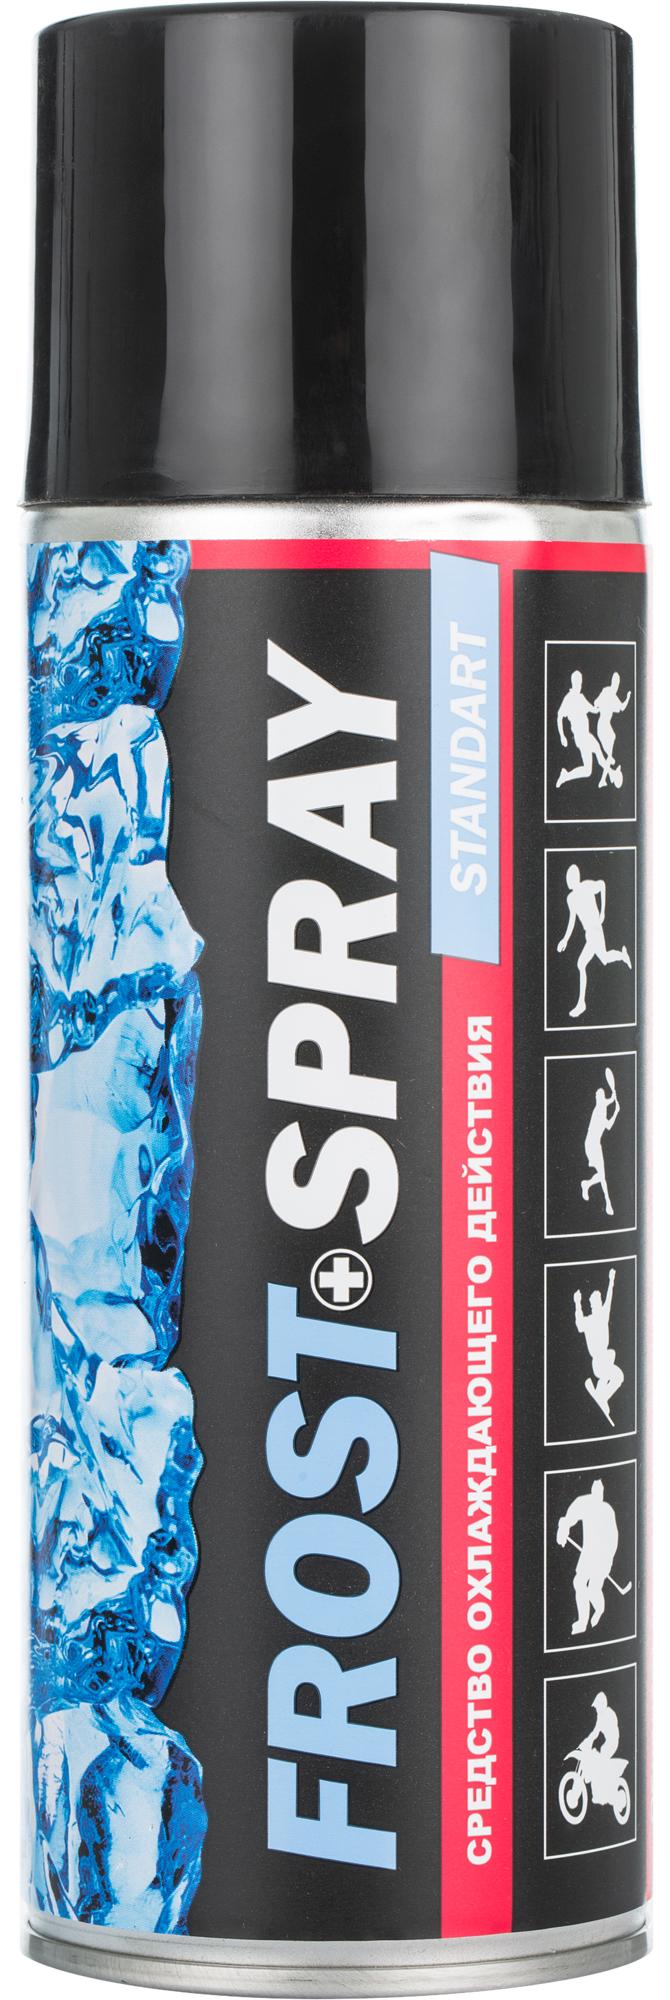 FROST SPRAY Спрей охлаждающий Frost Spray